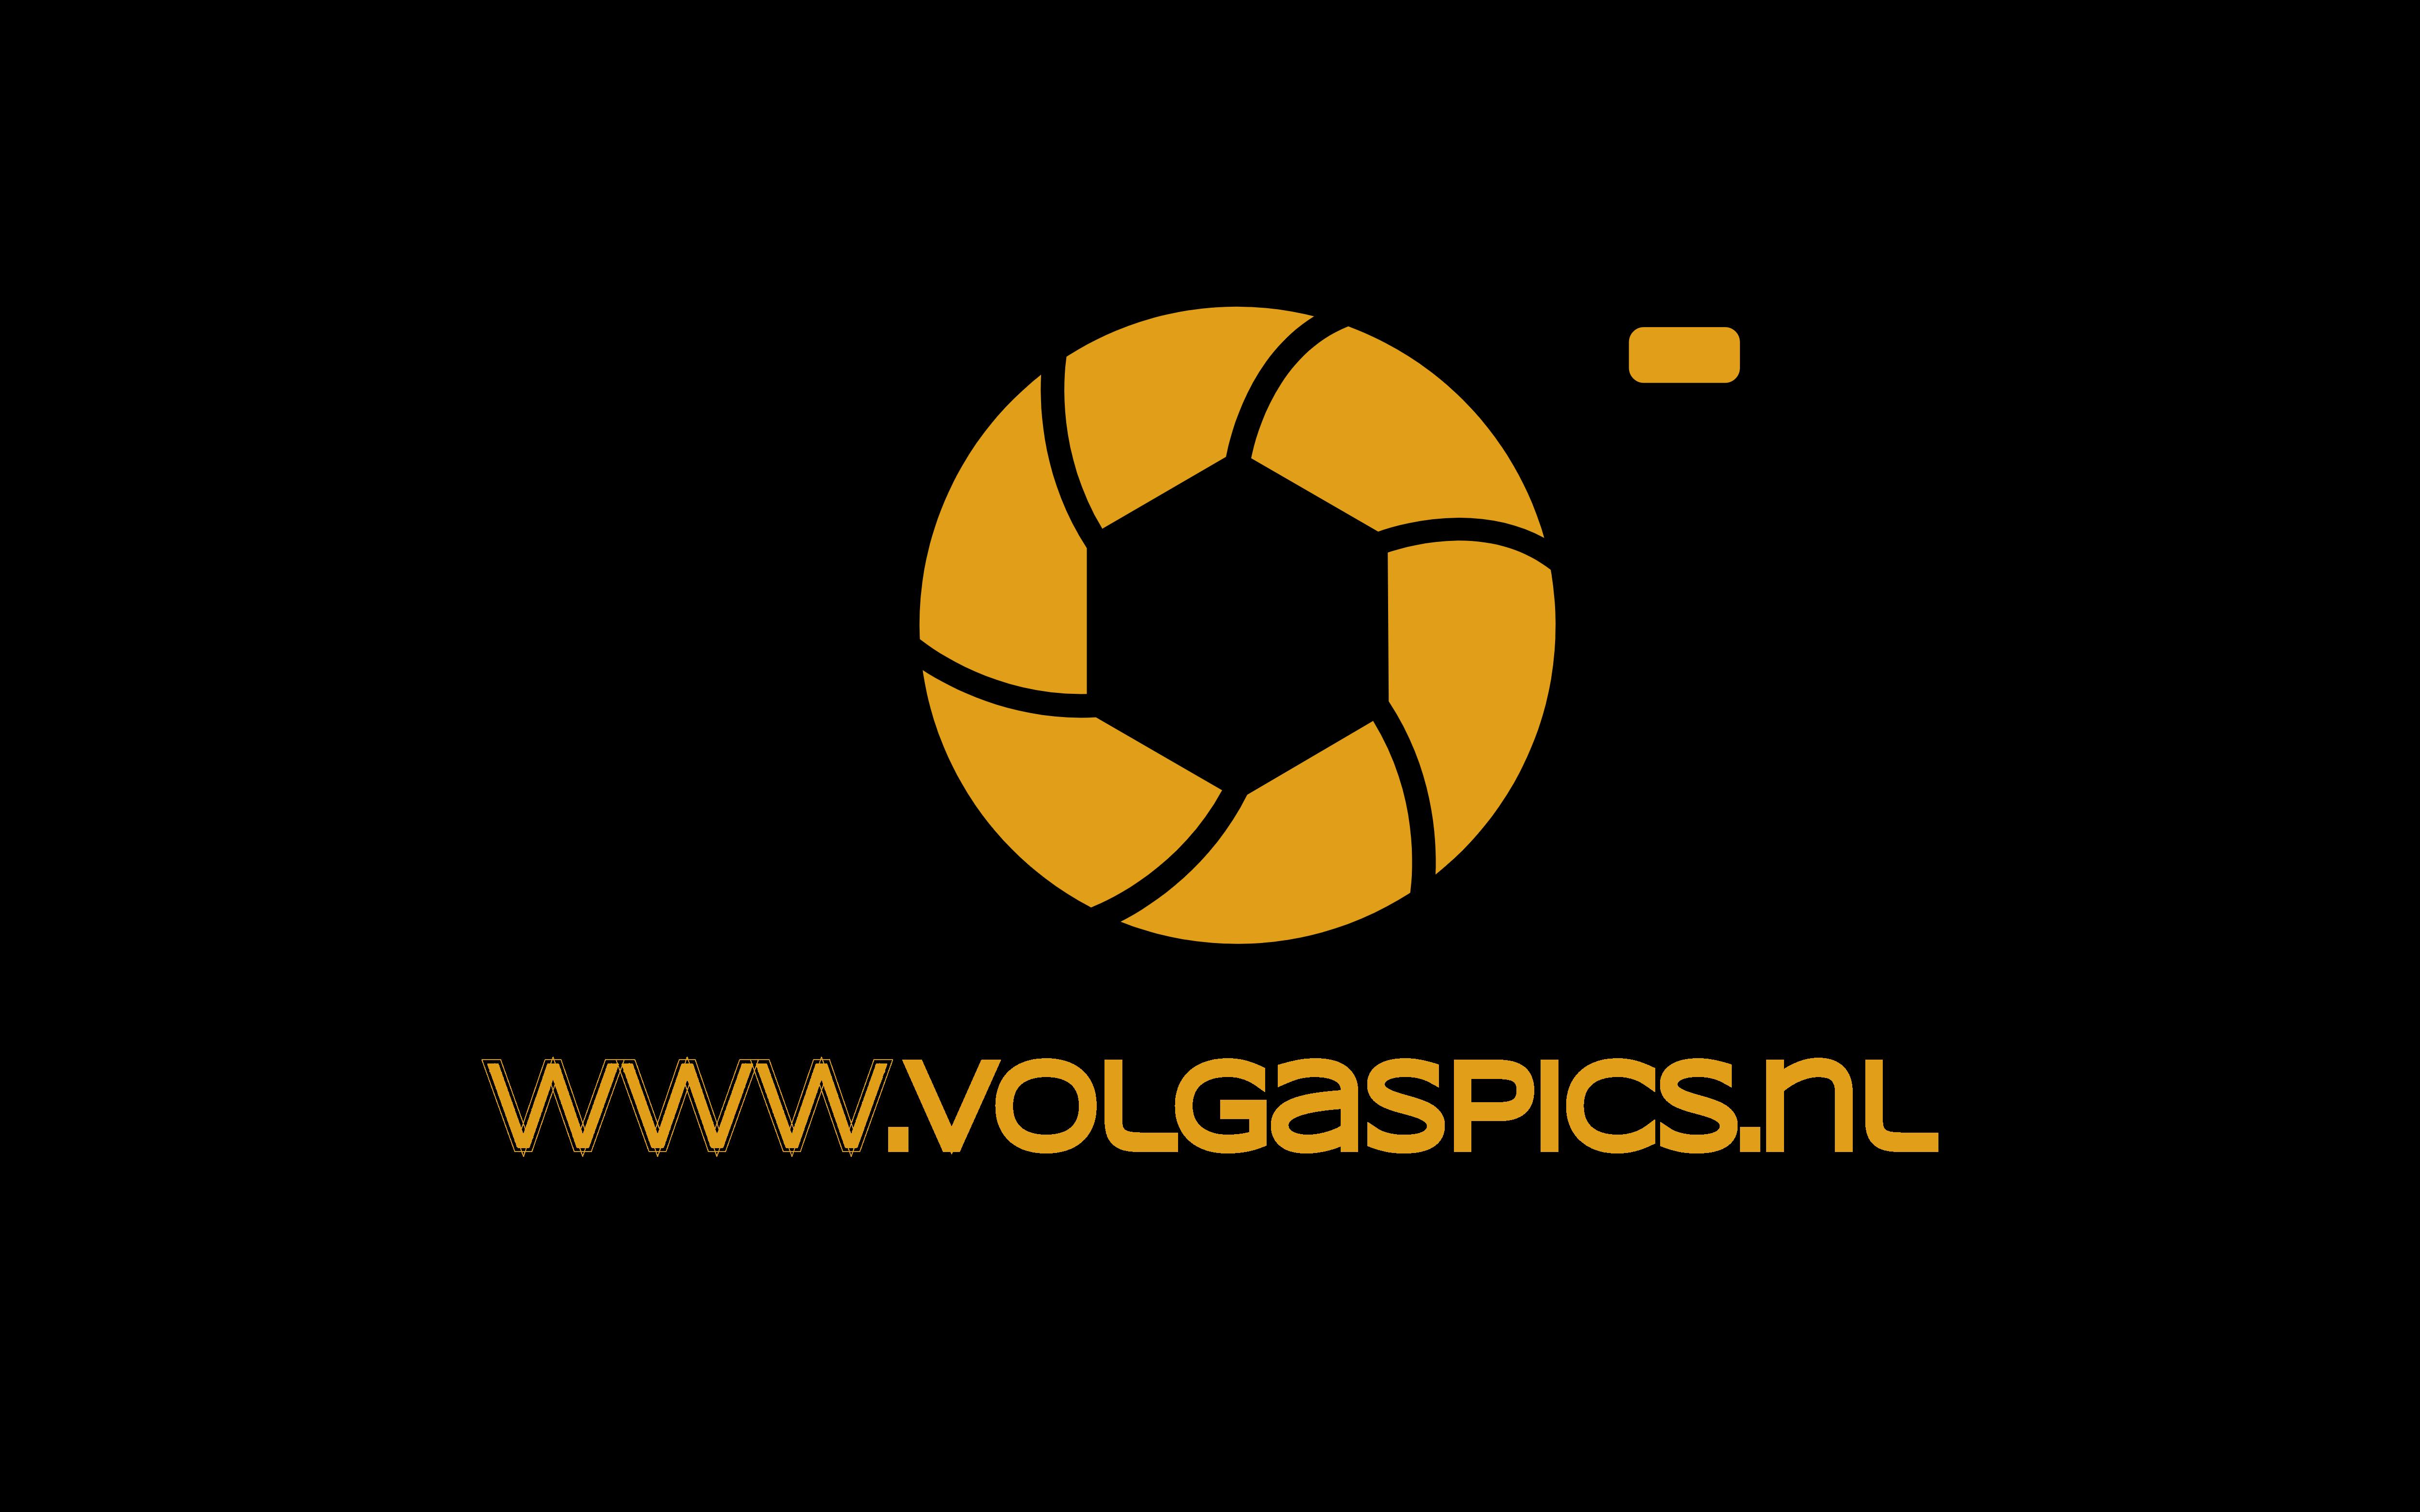 Volgaspics.nl